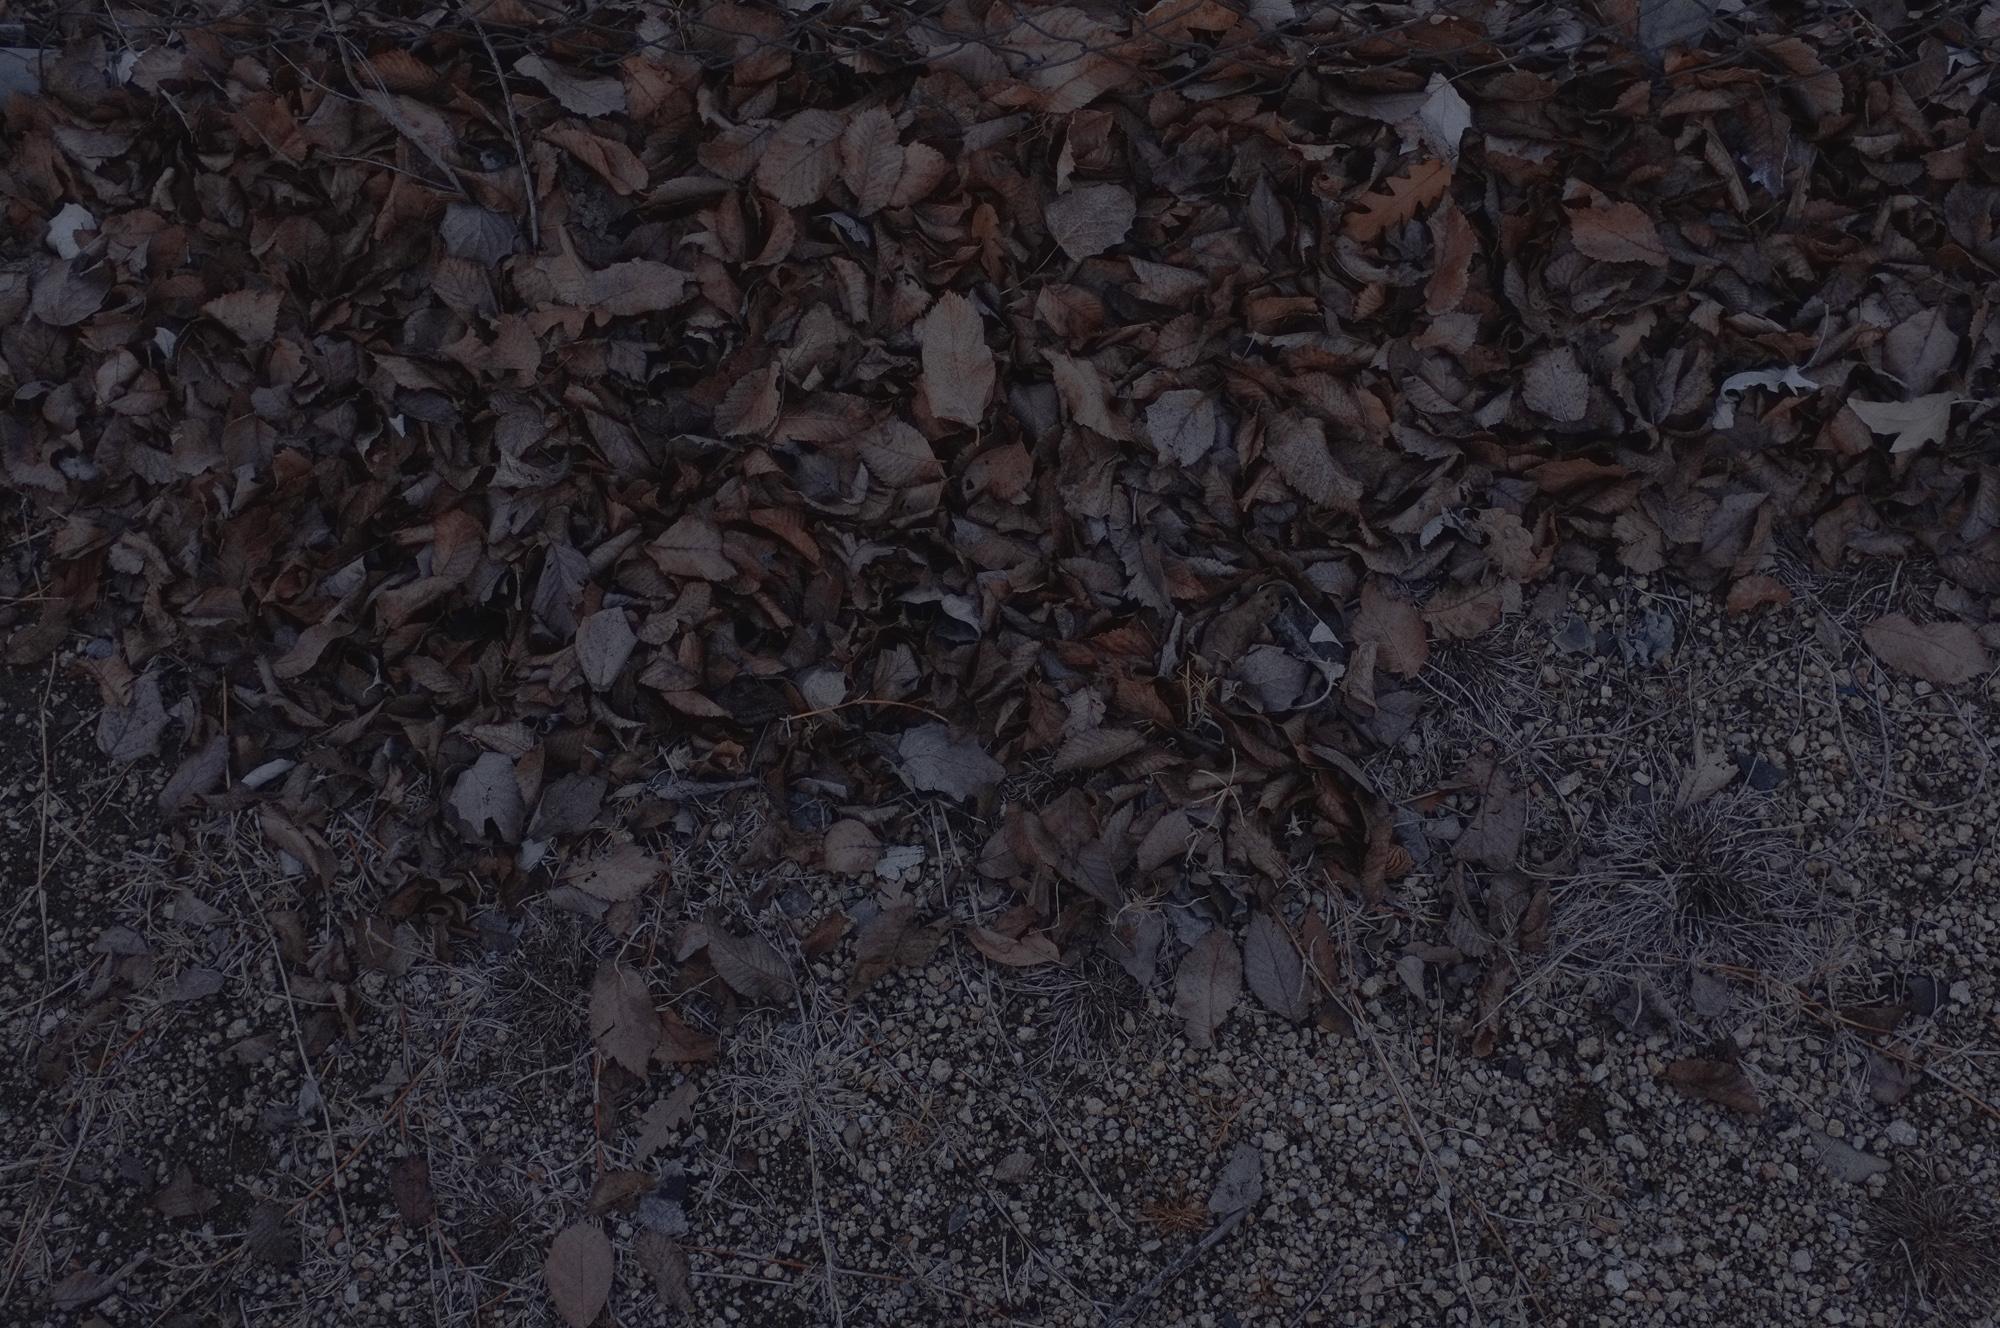 YTYKY_SAMMBLAKE_EASTERLYWINDS_015.jpg